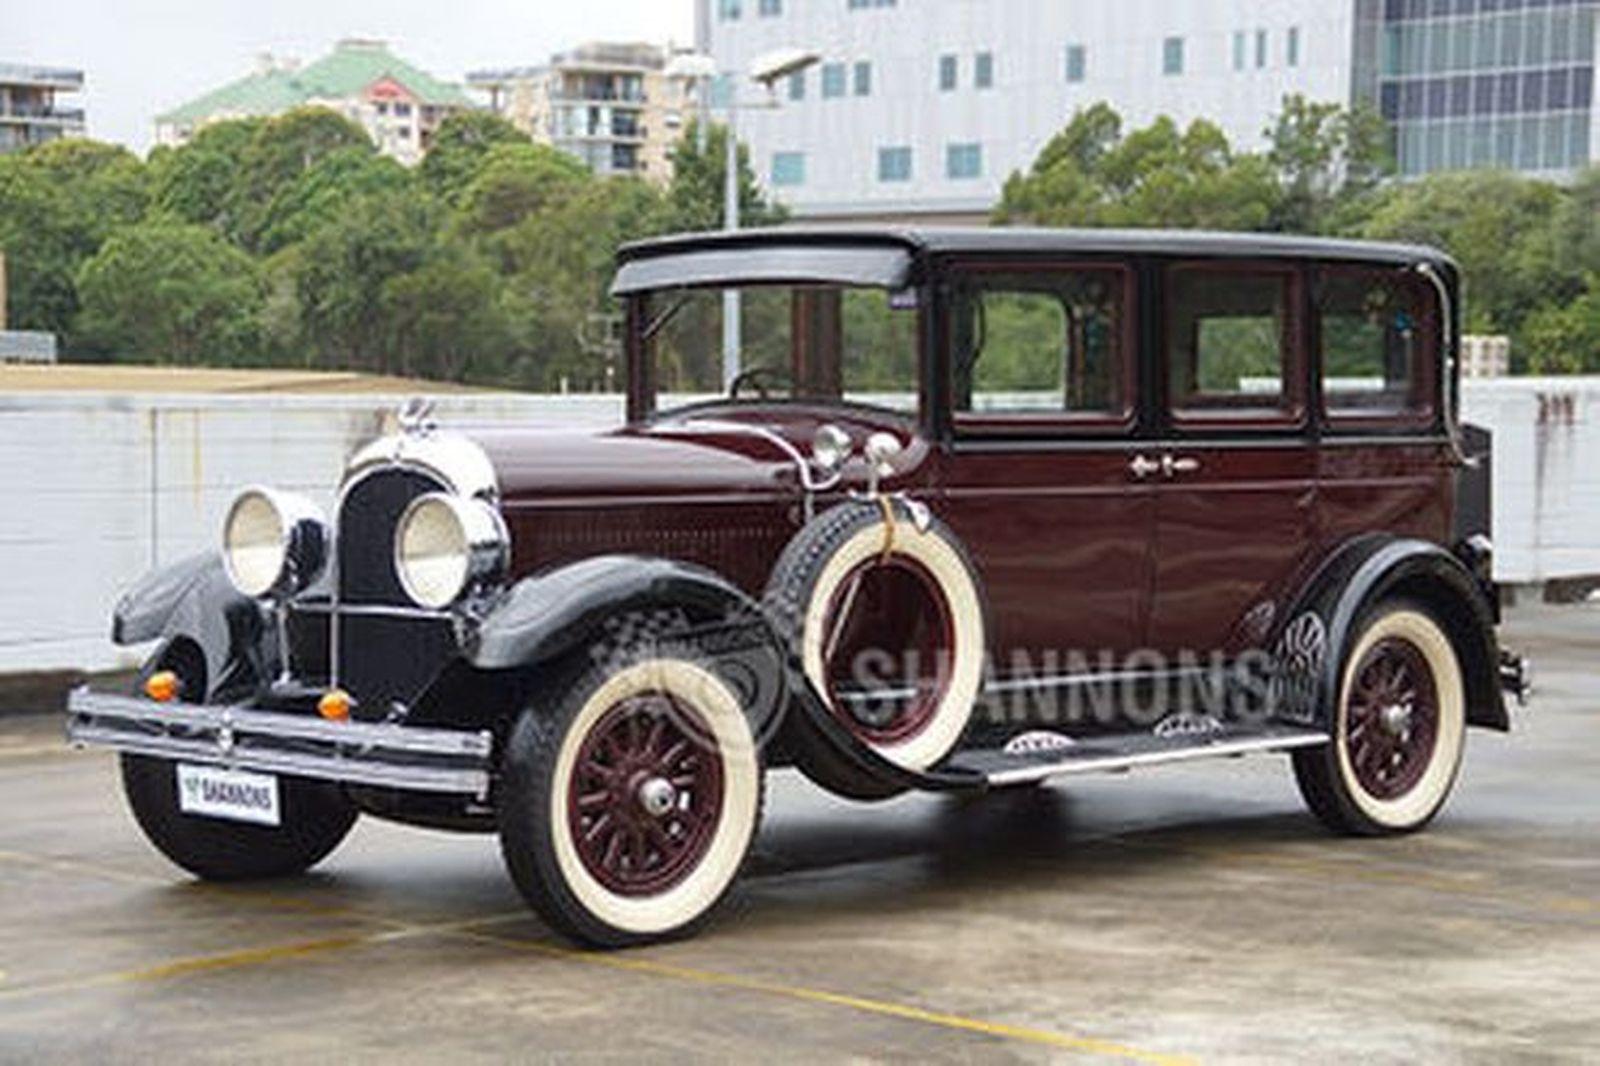 sold chrysler royal series 72 6 wheel equipped sedan rhd auctions lot 9 shannons. Black Bedroom Furniture Sets. Home Design Ideas